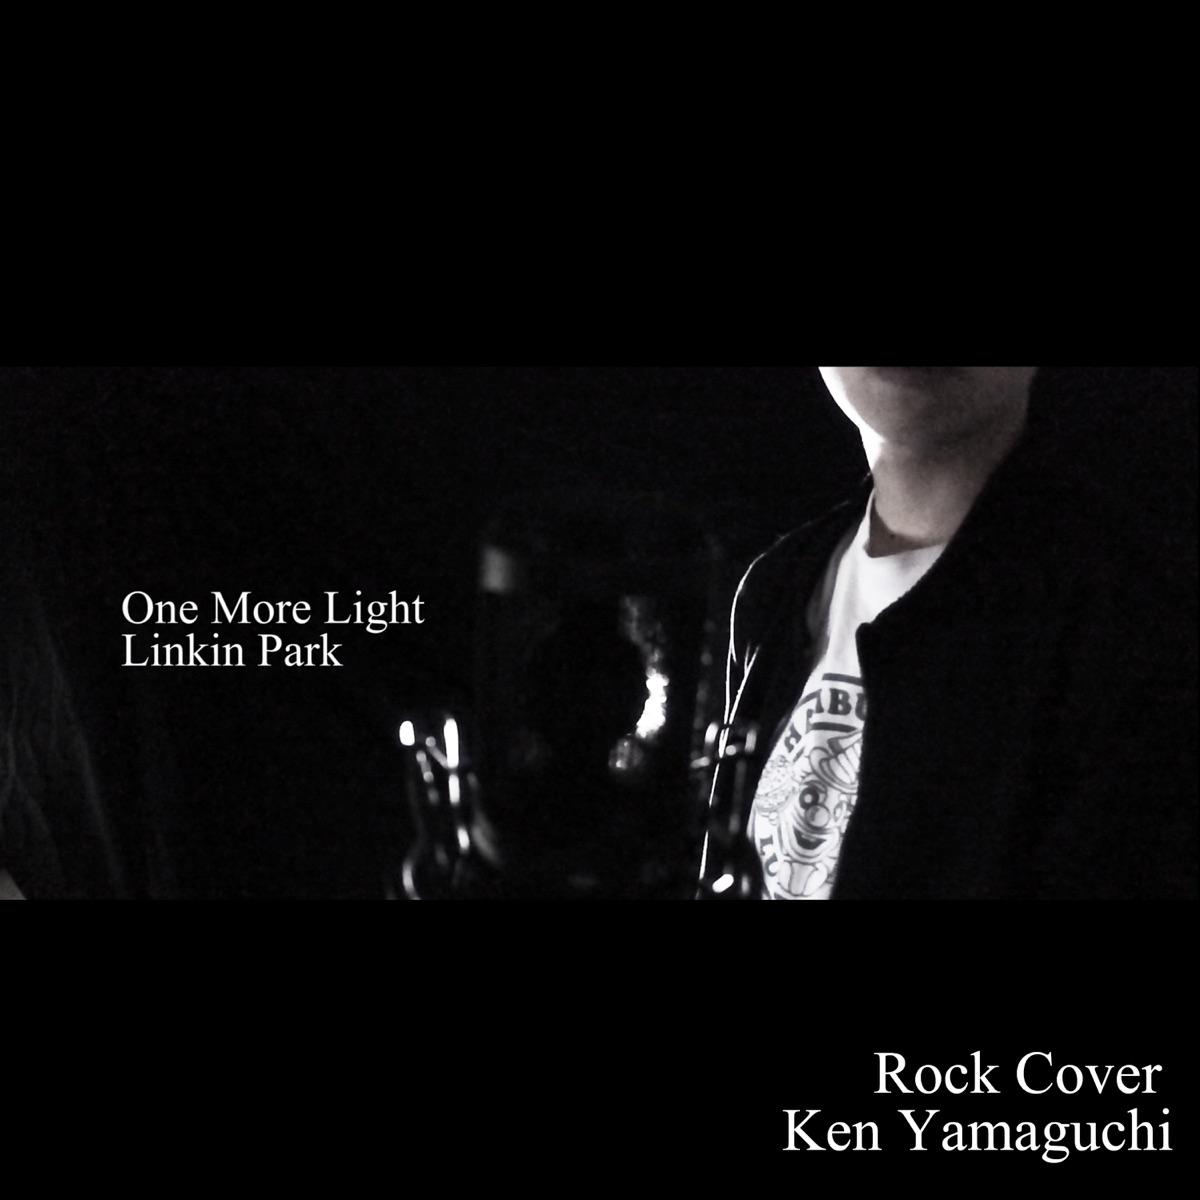 One More Light Rock Version - Single Ken Yamaguchi CD cover